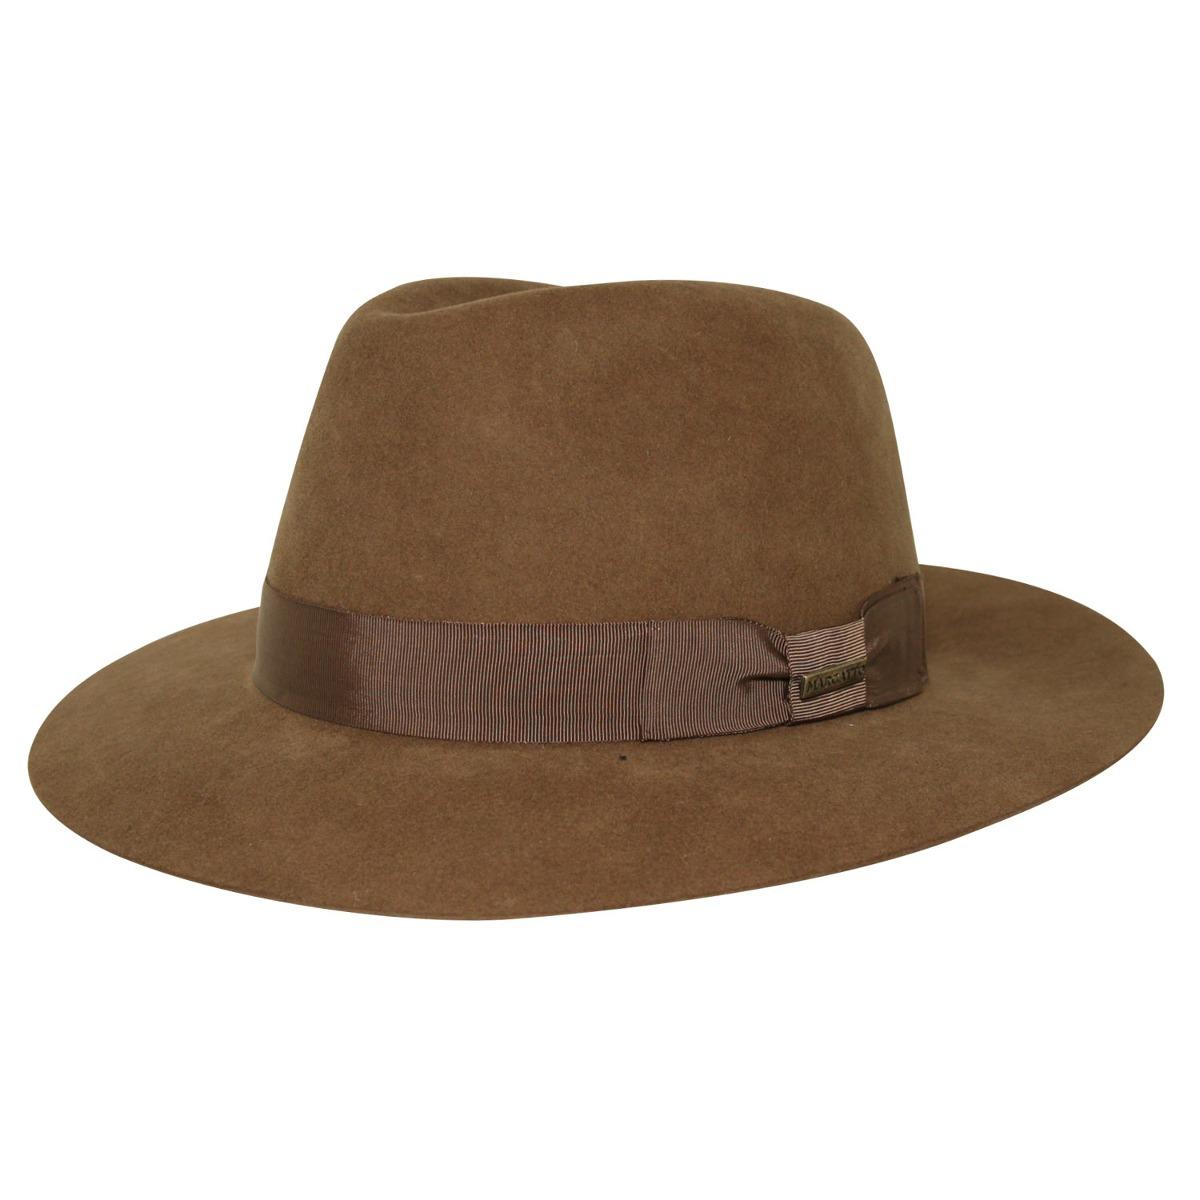 760ebfb9d06ae chapéu marcatto pêlo de lebre kennedy marrom-tamanho 58. Carregando zoom.